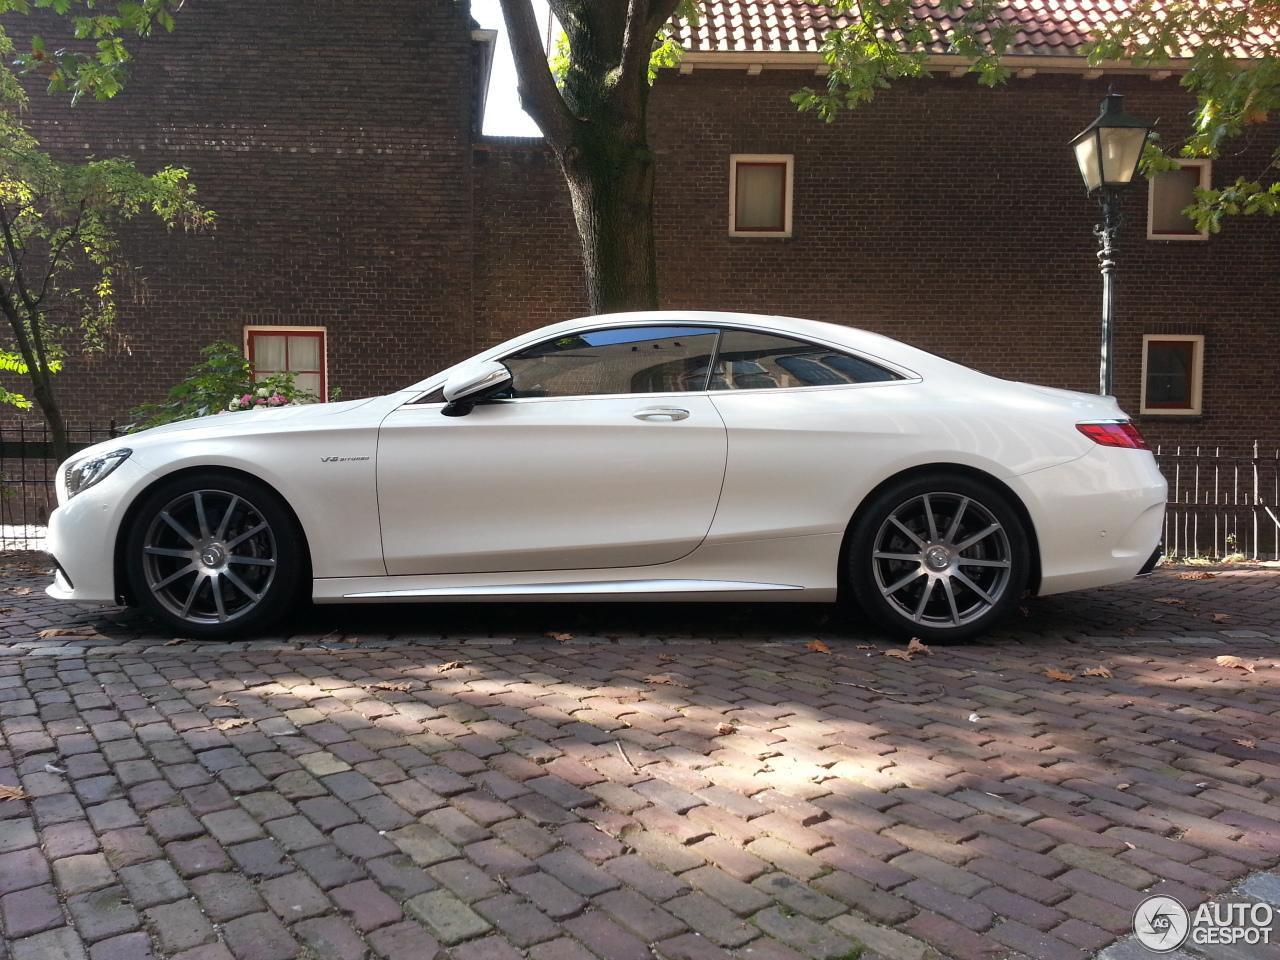 Mercedes benz s 63 amg coup c217 3 oktober 2014 for Mercedes benz s coupe 2014